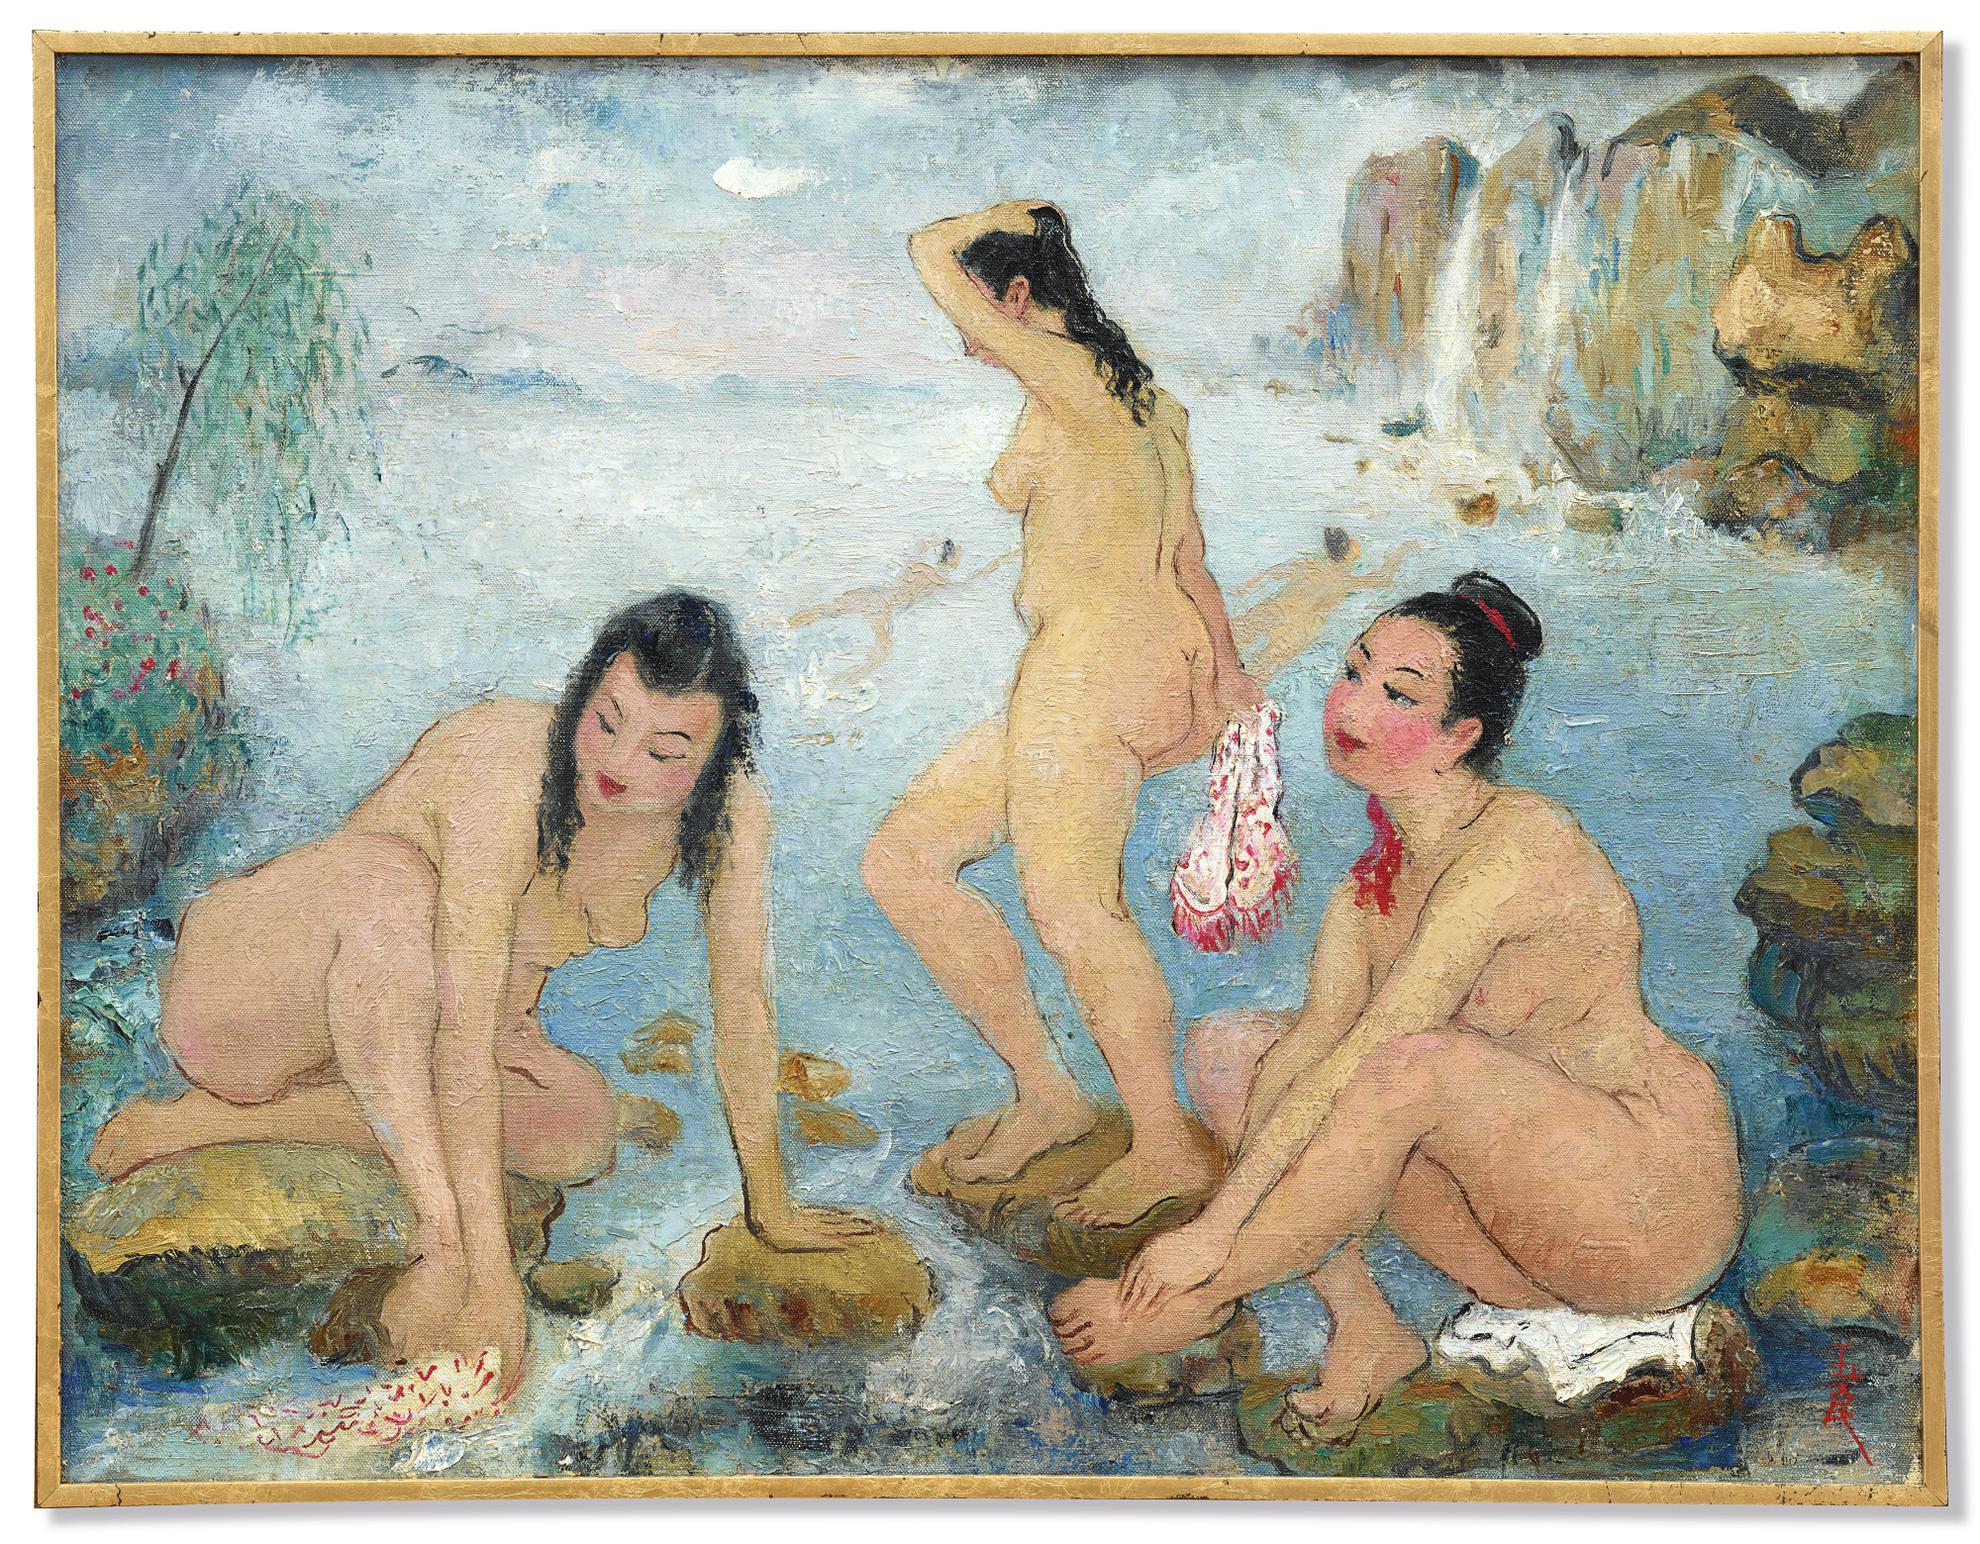 Pan Yuliang-Baigneuse-1958